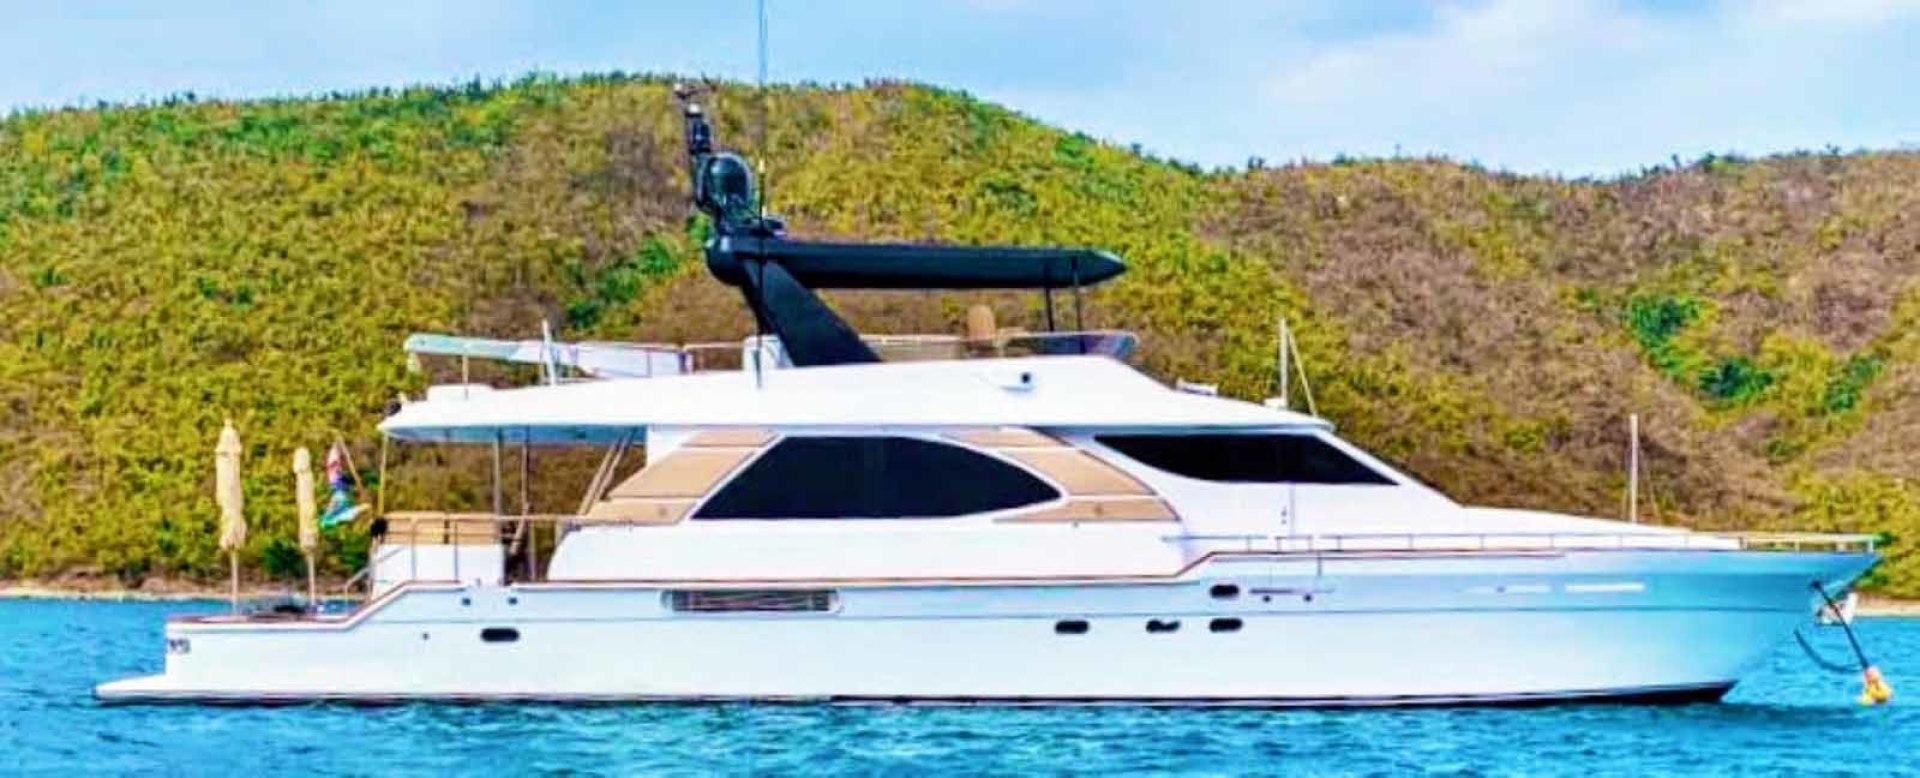 Queenship-Barretta 76 2004-SEA MYSTIC Fort Myers-Florida-United States-024   Profile-1588173 | Thumbnail